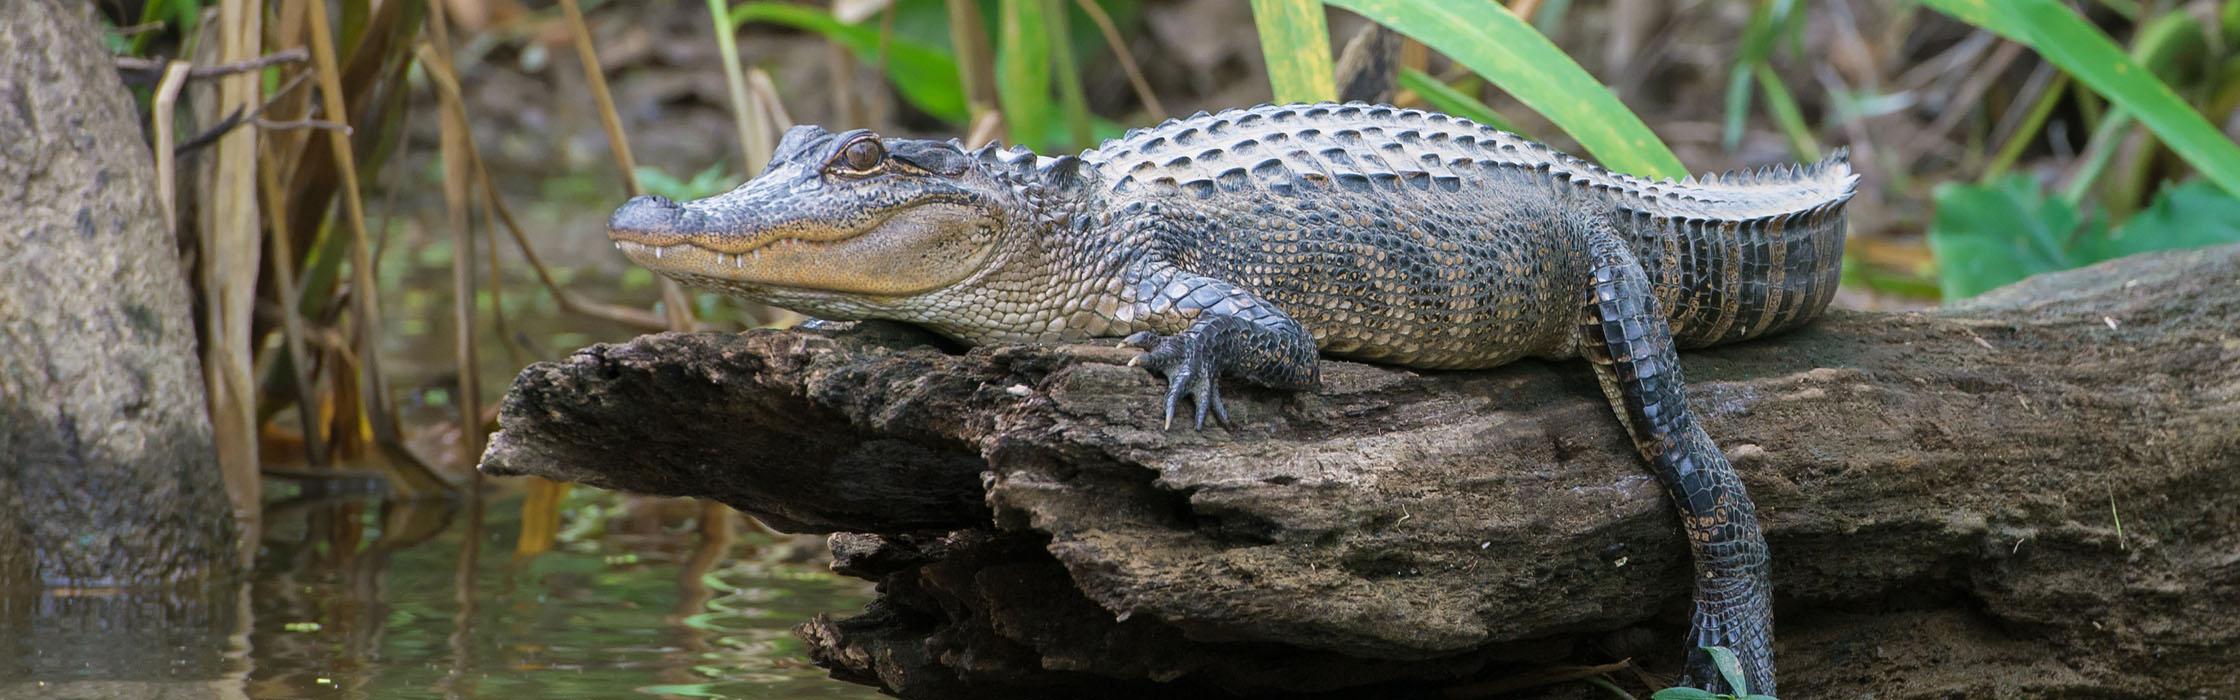 Wildlife-Our Animals-Alligator_American2240x700